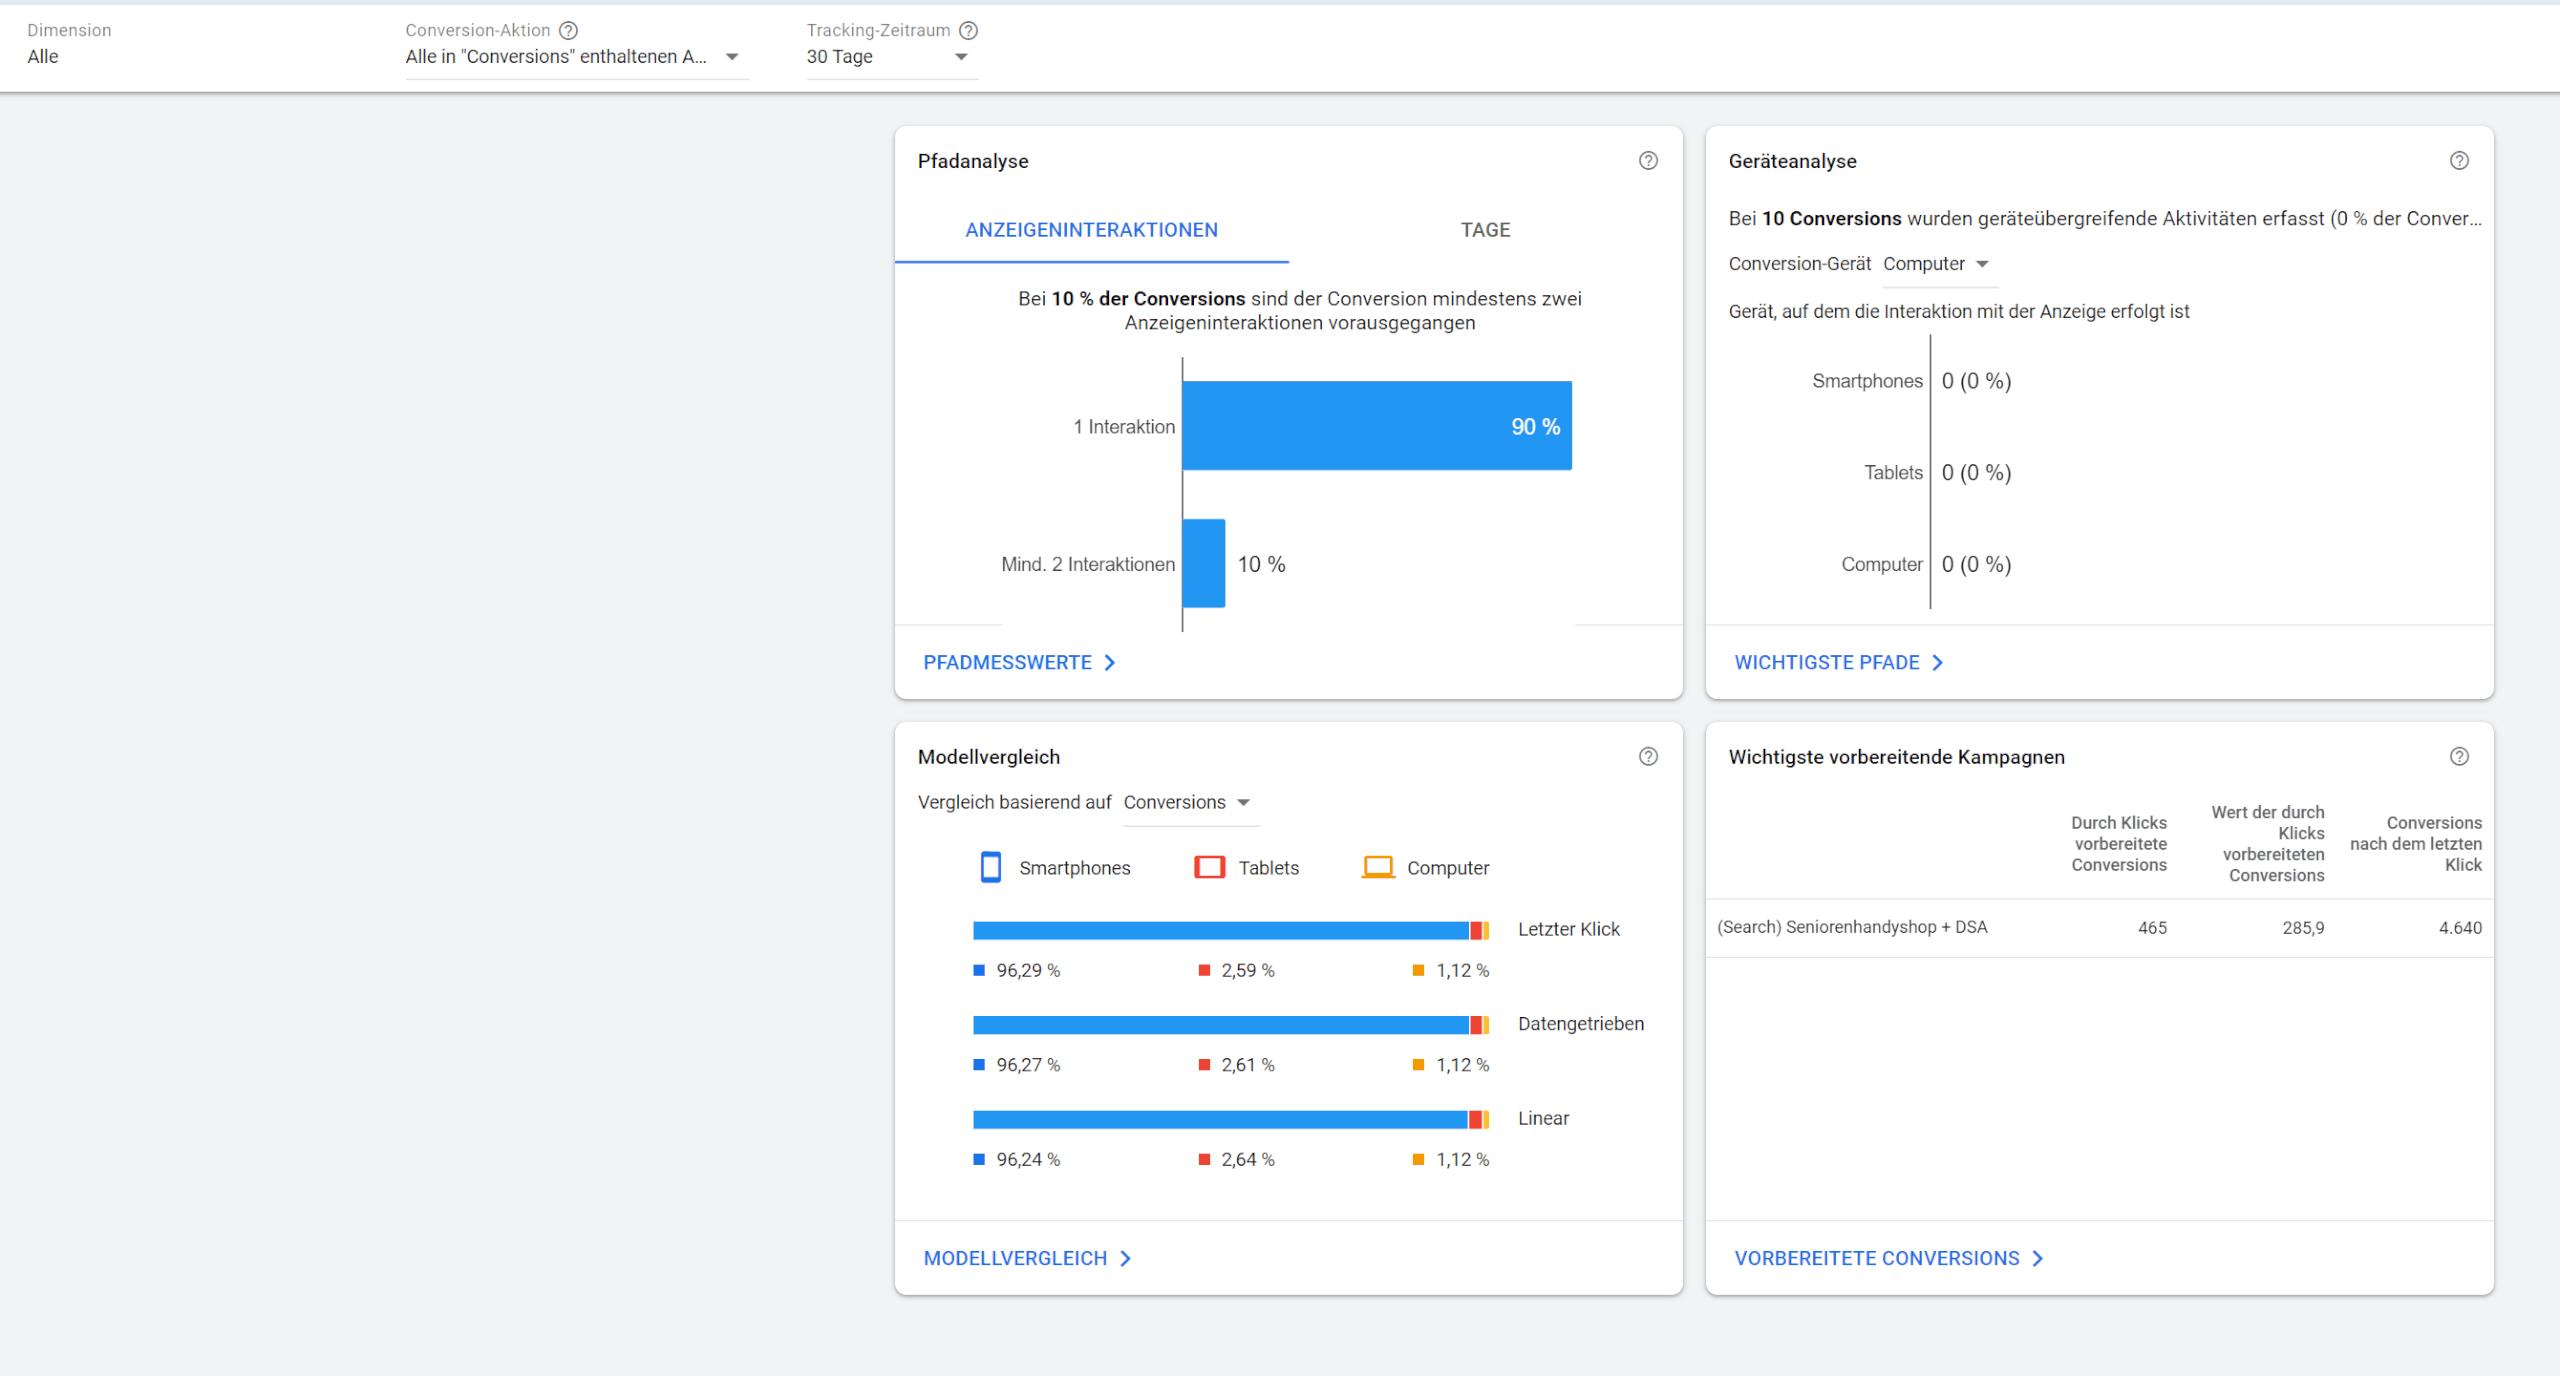 Google Ads Attribution Auswertung